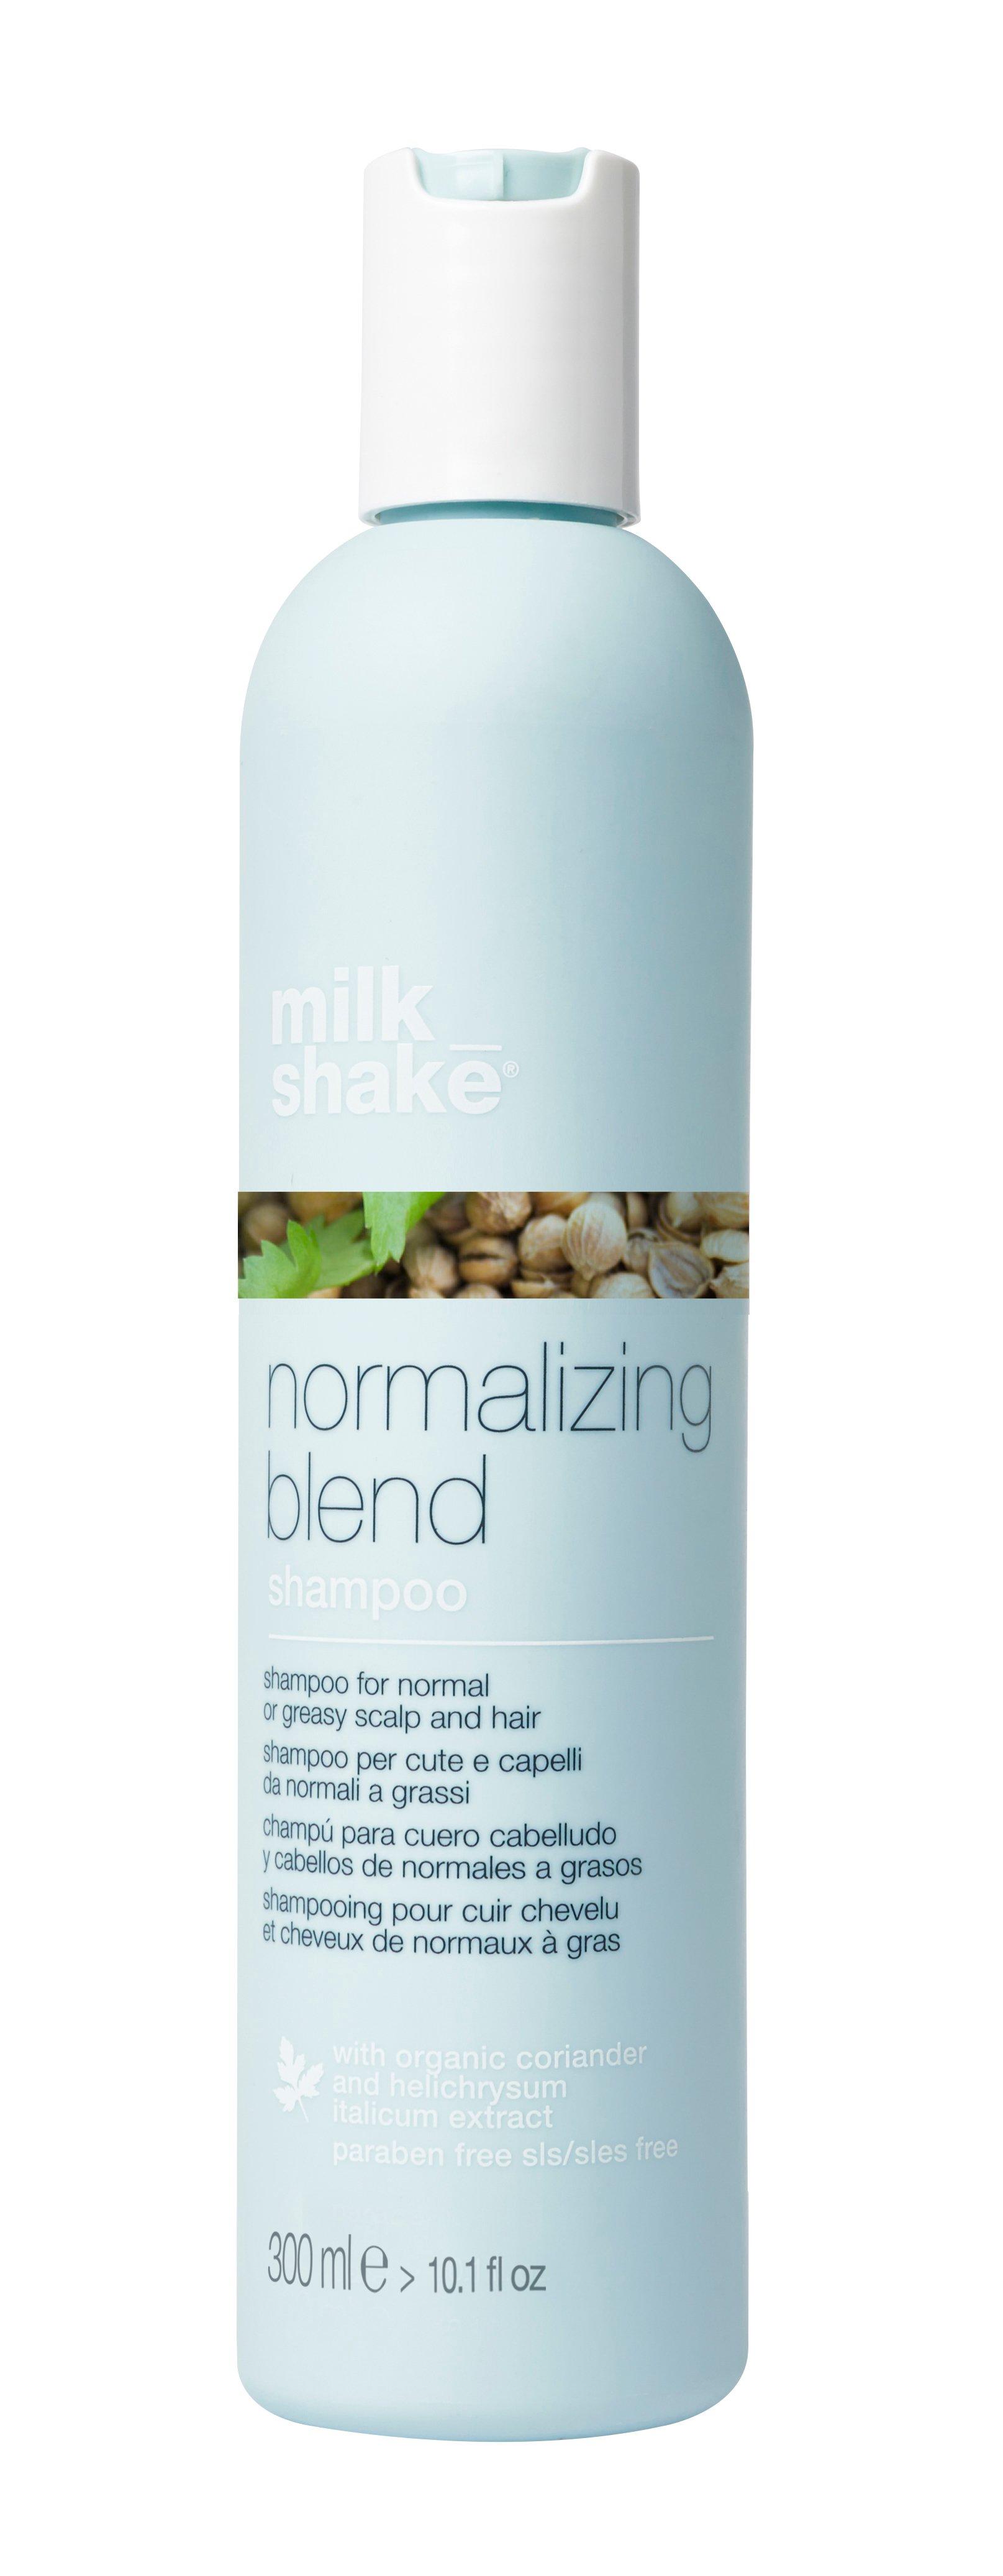 milk_shake - Normalizing Blend Shampoo 300 ml